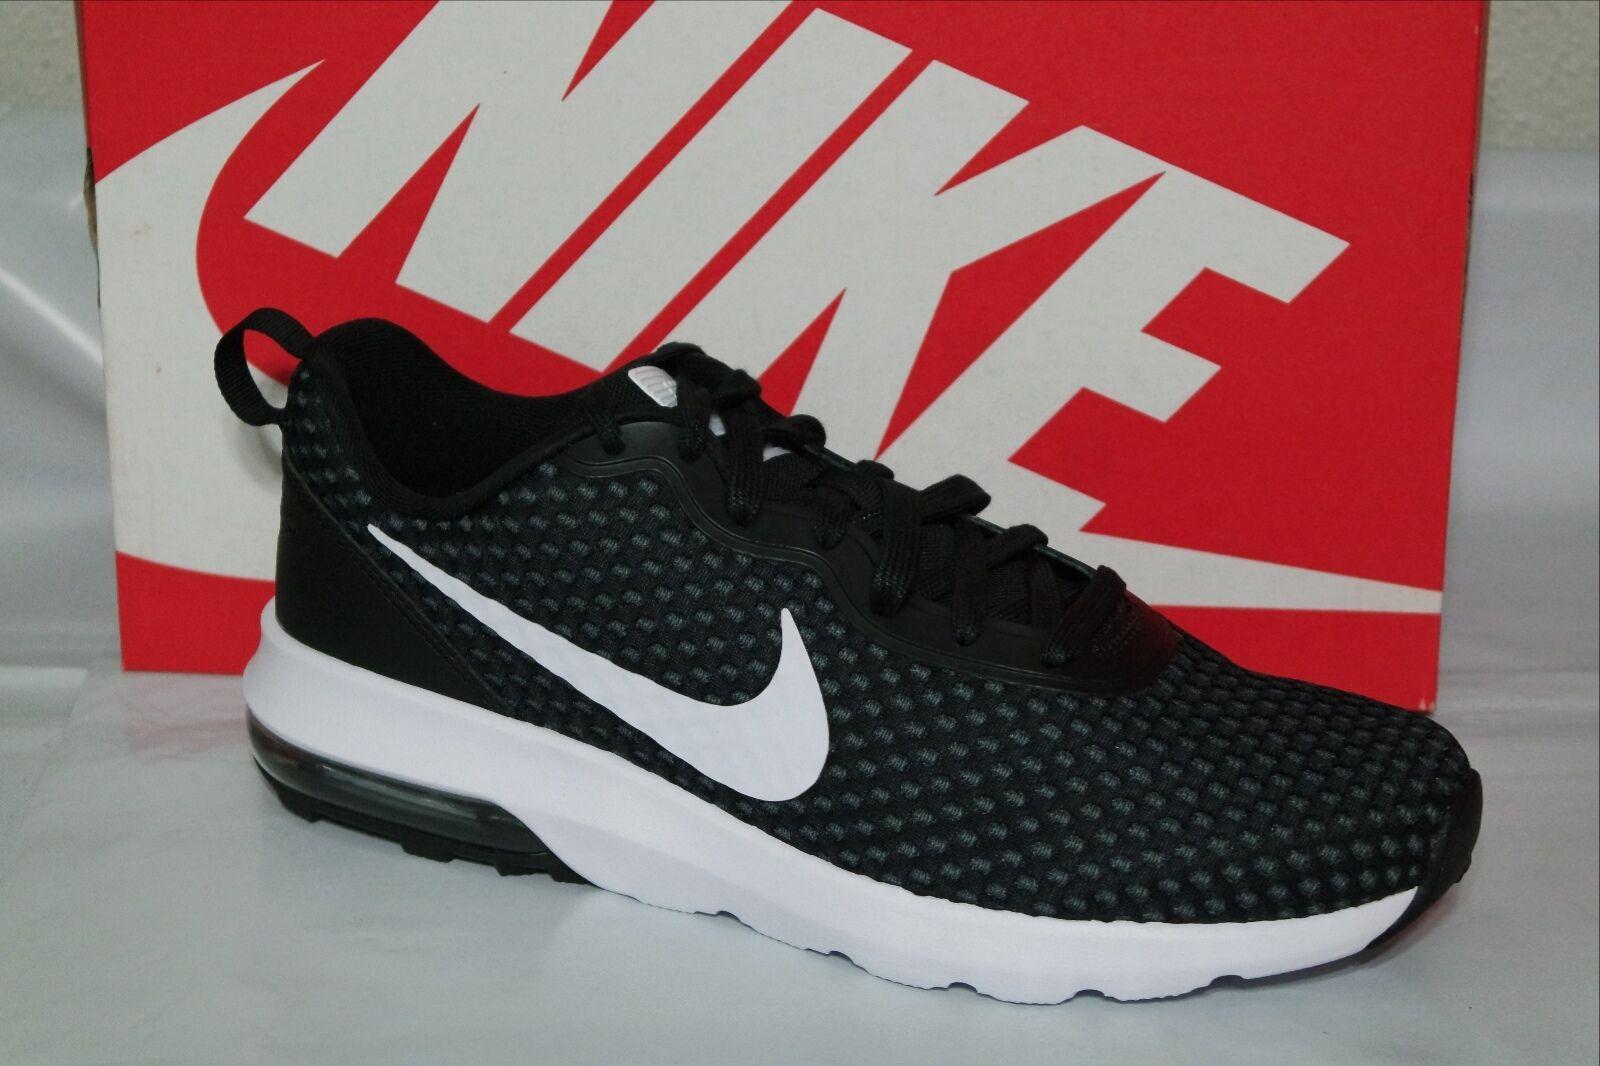 NIKE AIR MAX TURBULENCE LS MEN'S RUNNING SHOE, BLACK/WHITE, 827177 010 Cheap and beautiful fashion